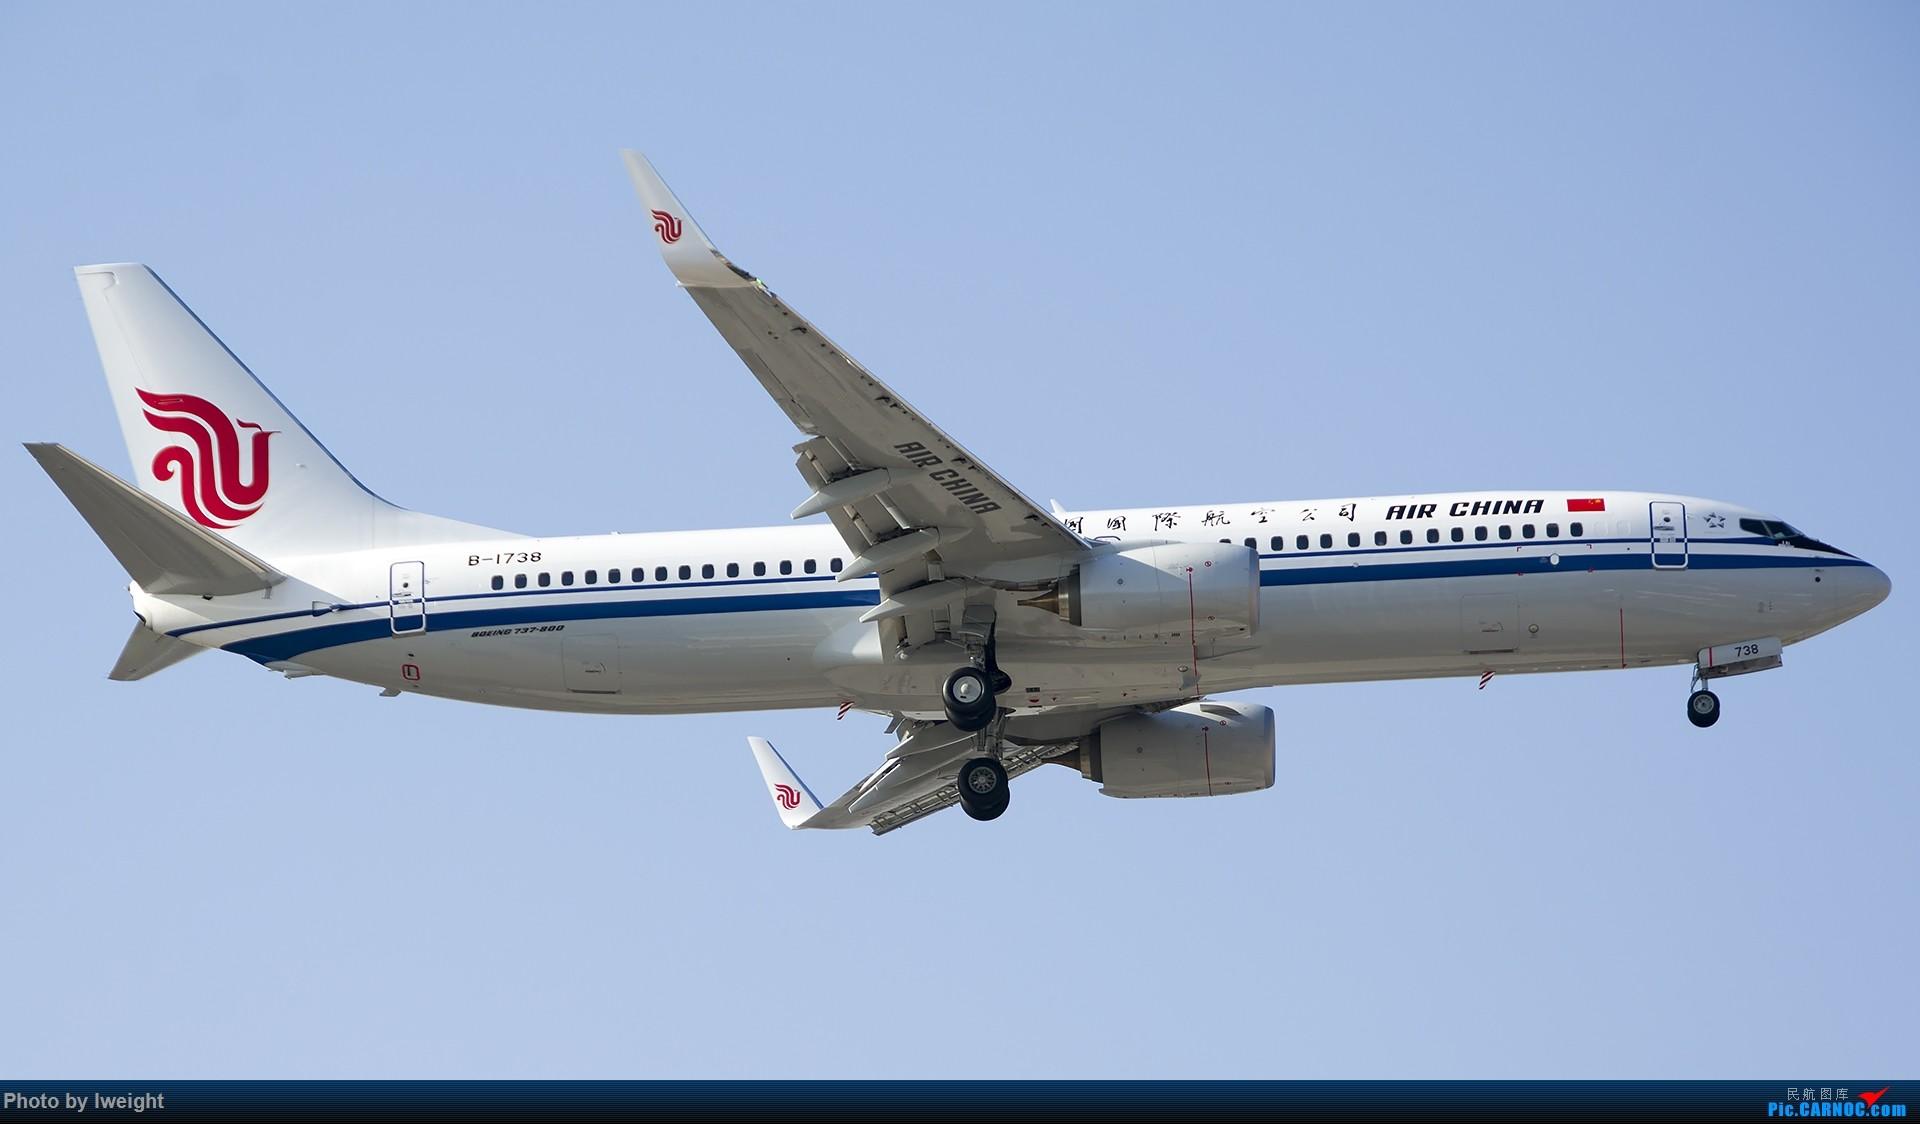 Re:[原创]2014-12-02 ZBAA随拍 BOEING 737-800 B-1738 中国北京首都国际机场